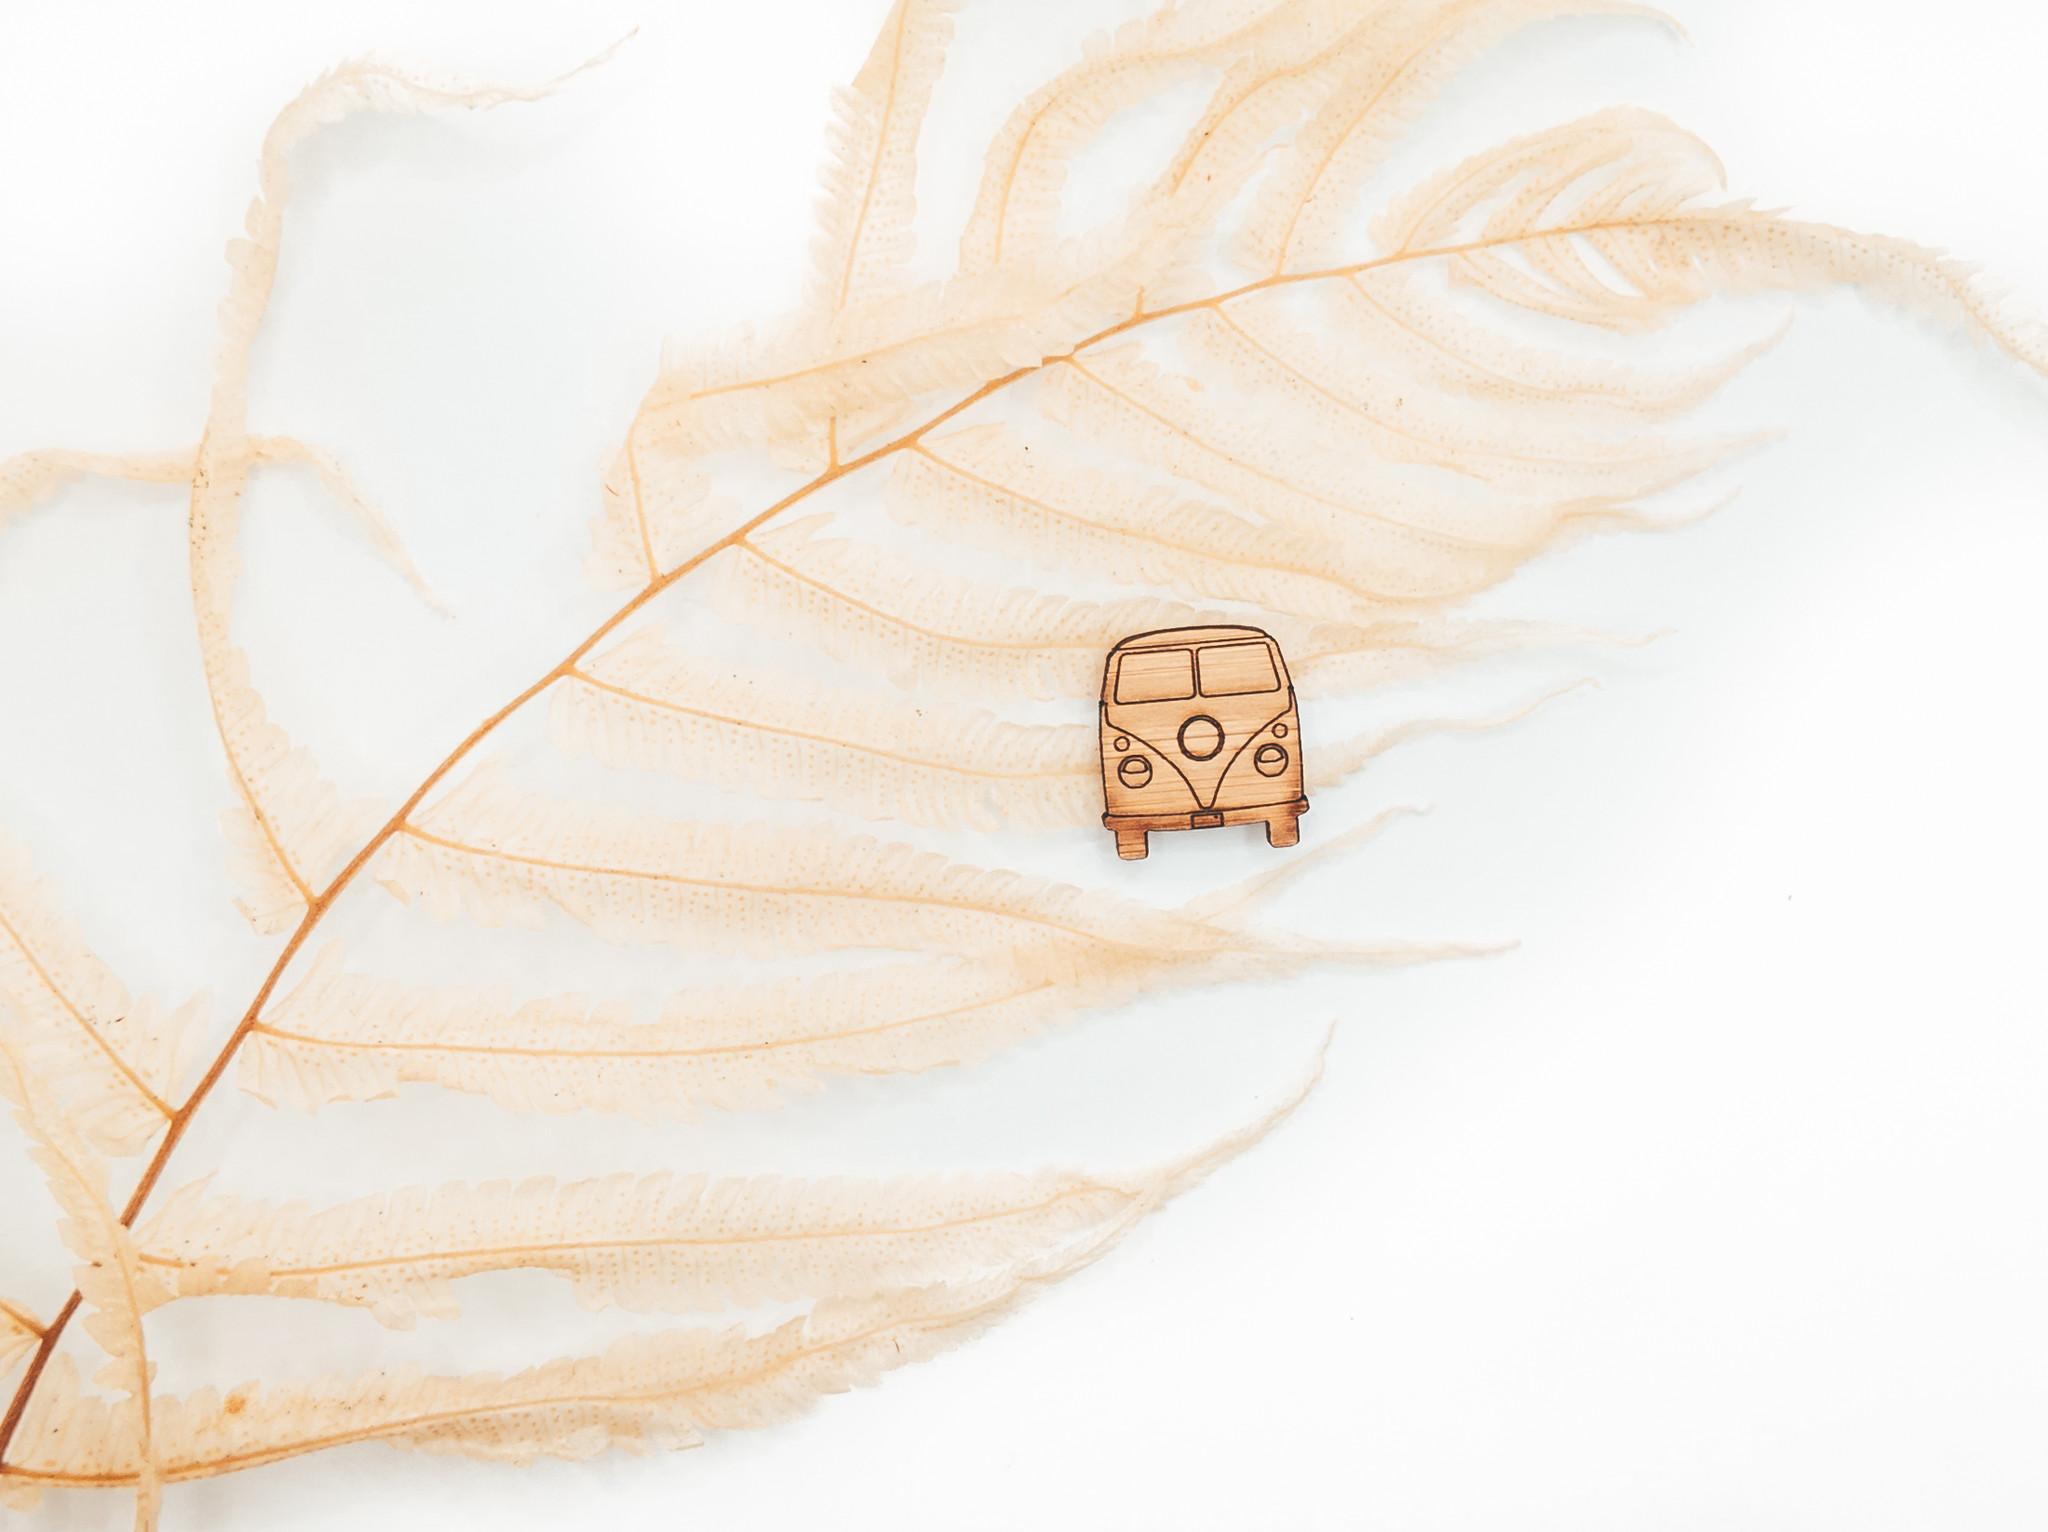 VW kombi handmade pin